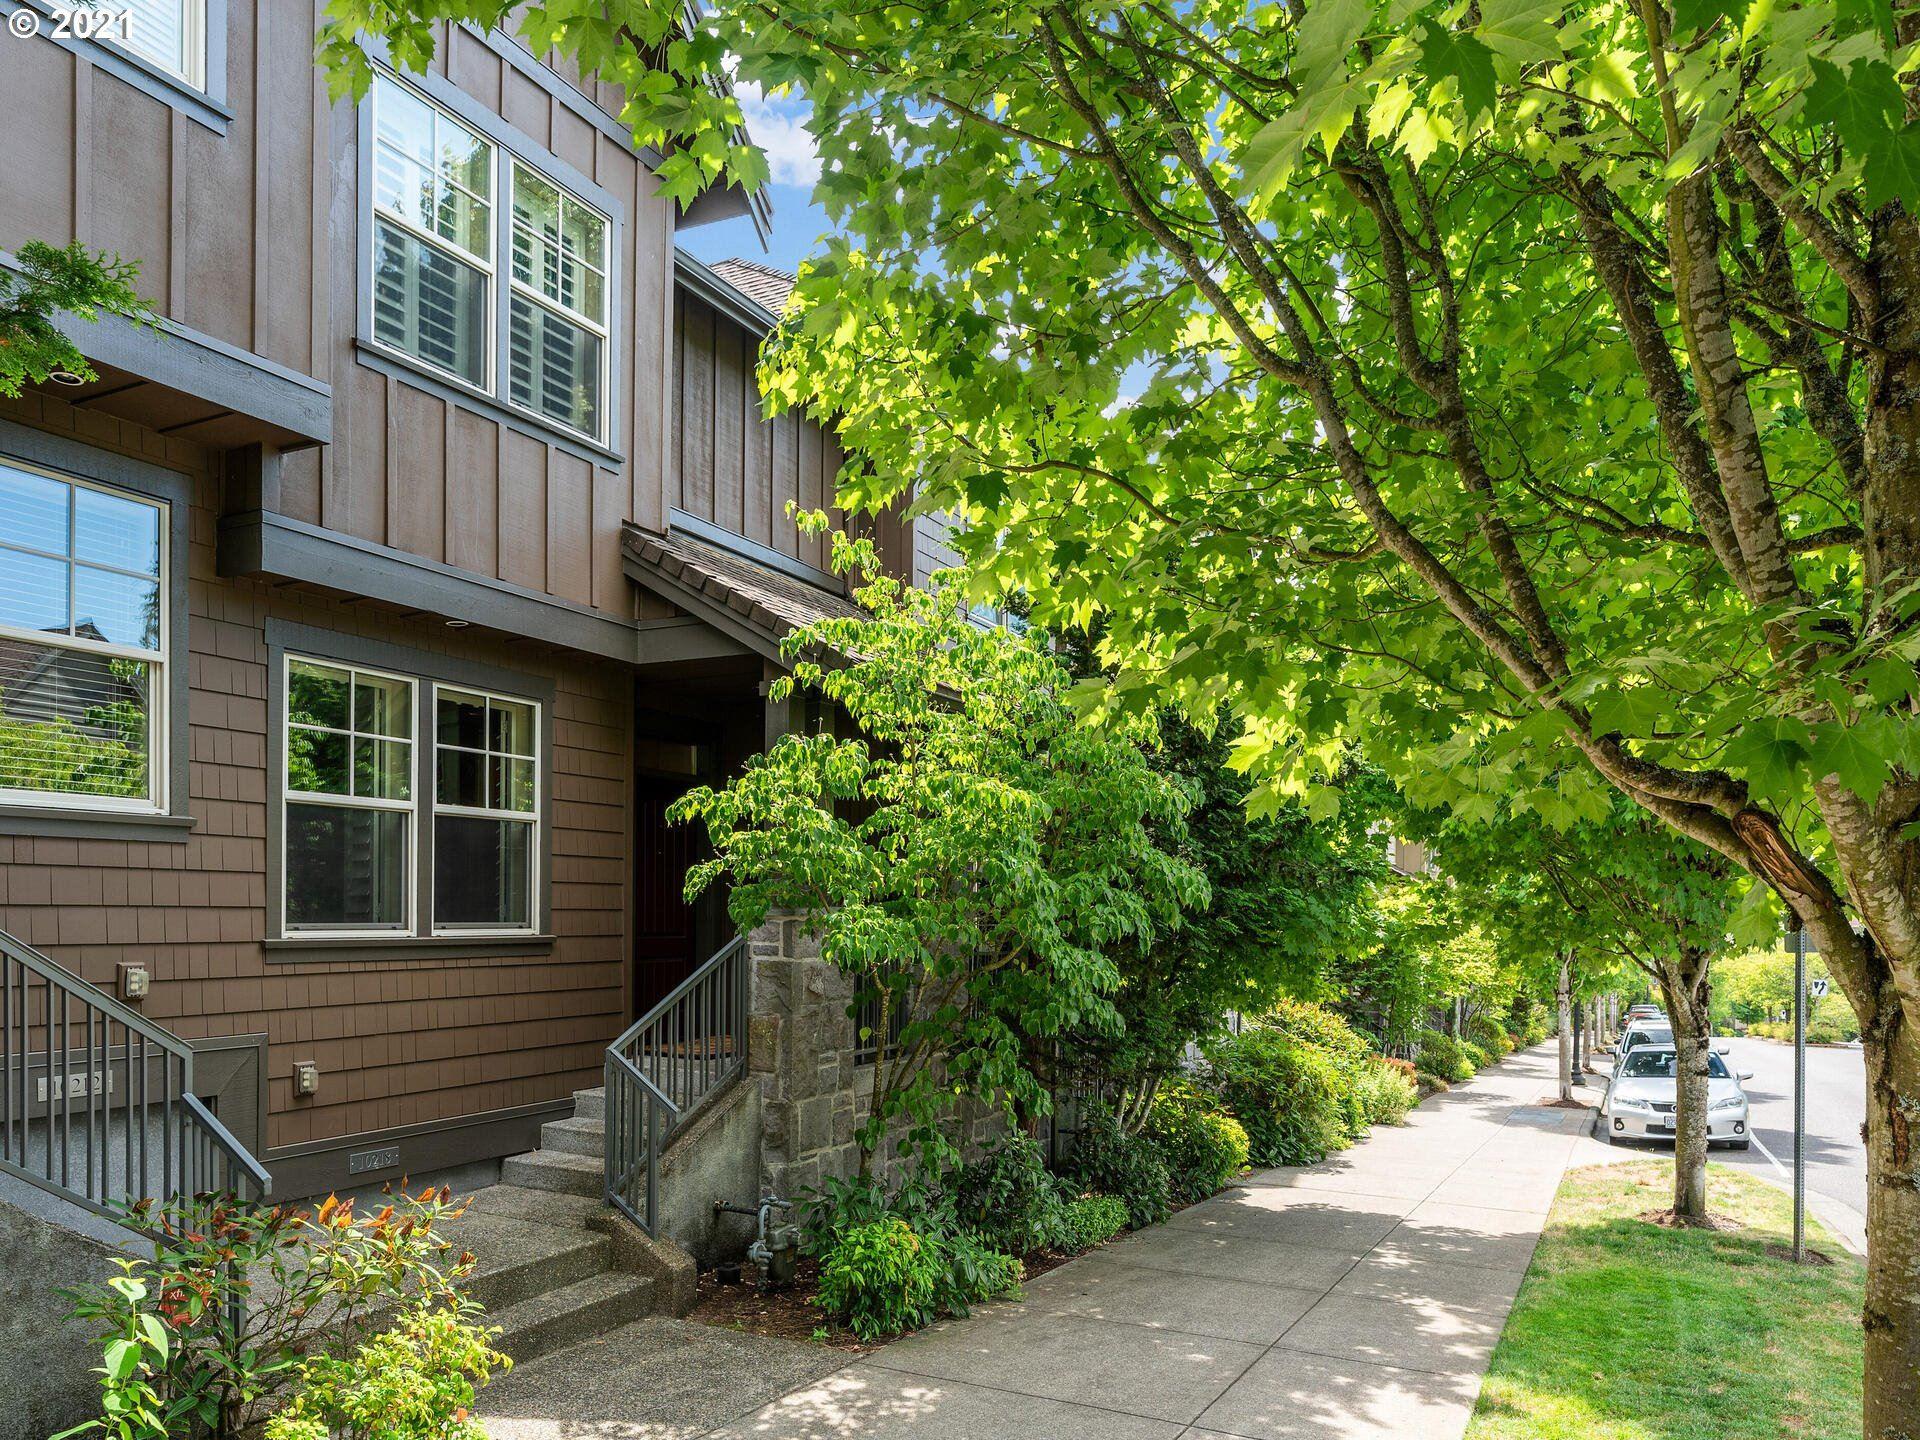 10218 SW TAYLOR ST, Portland, OR 97225 - MLS#: 21545691